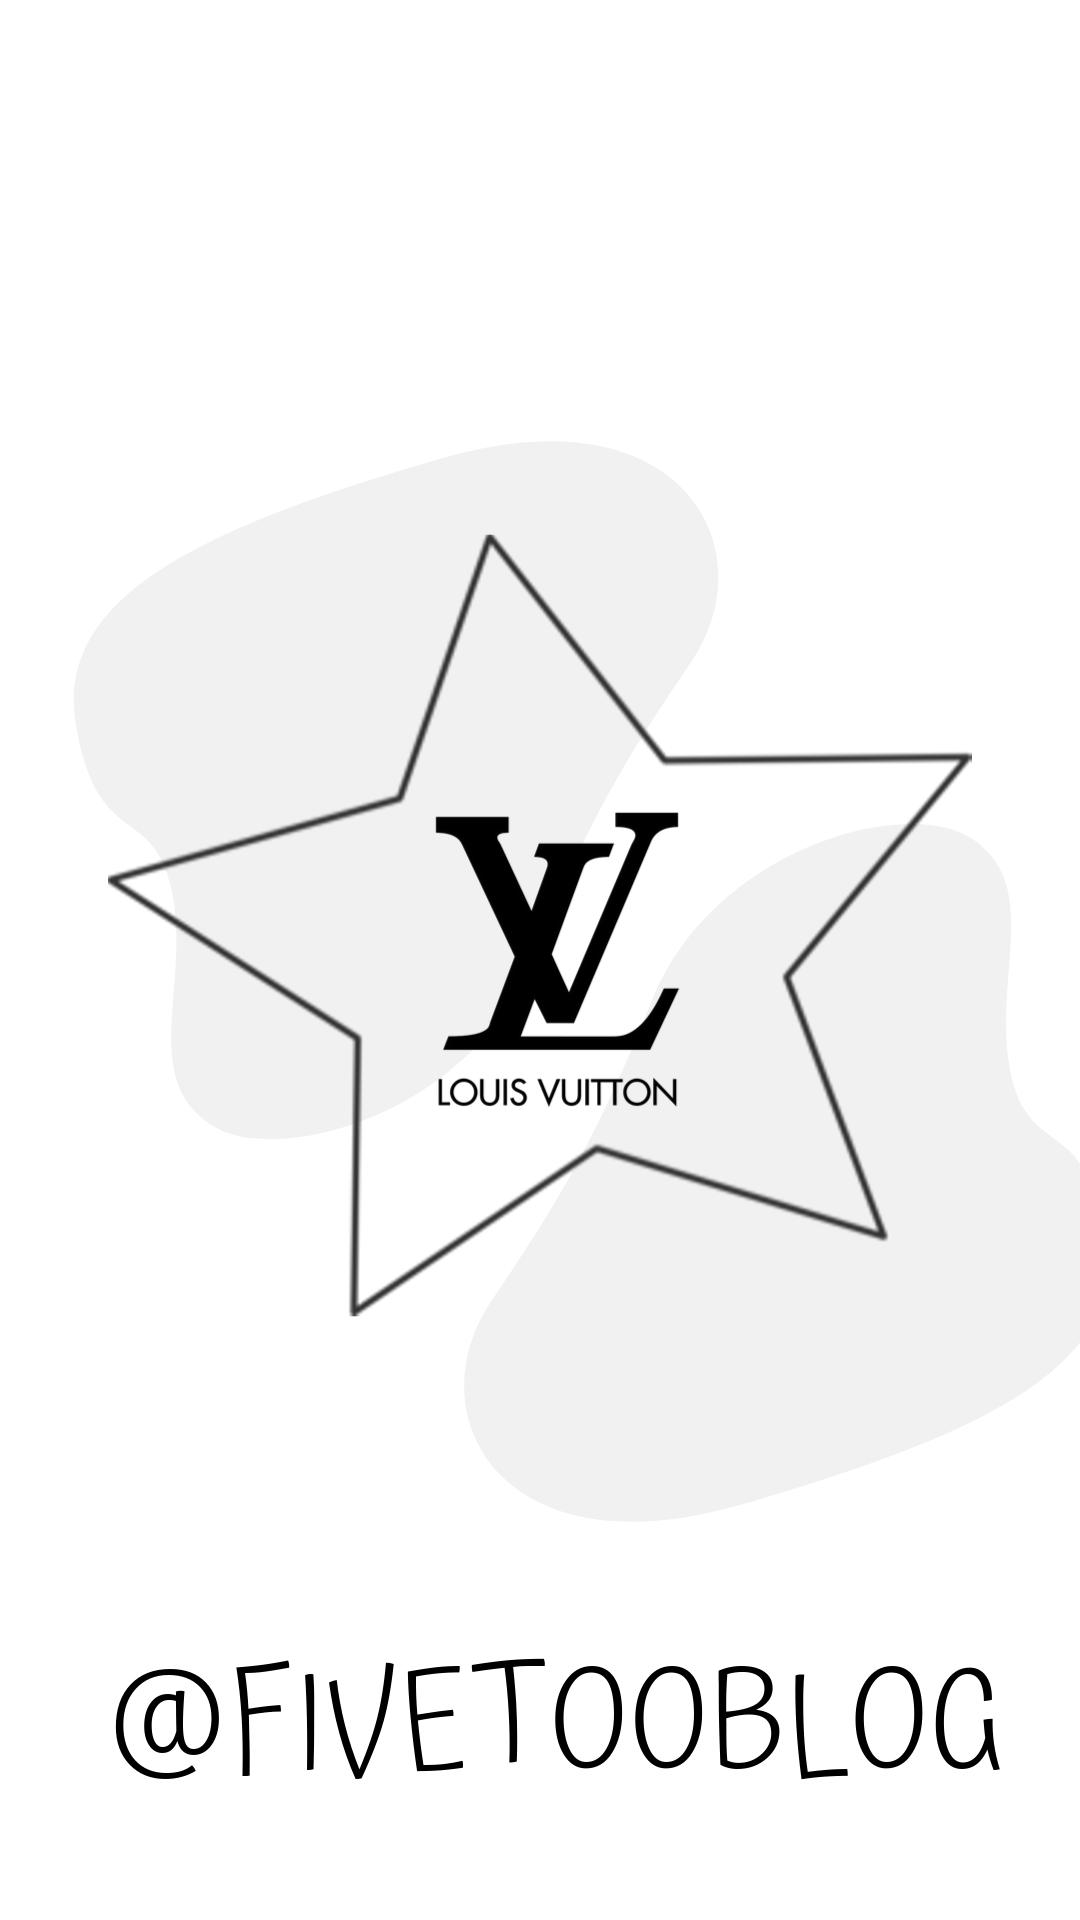 Lv Louis Vuitton Designer Instagram Highlight Cover Louis Vuitton Designer Louis Vuitton Instagram Story